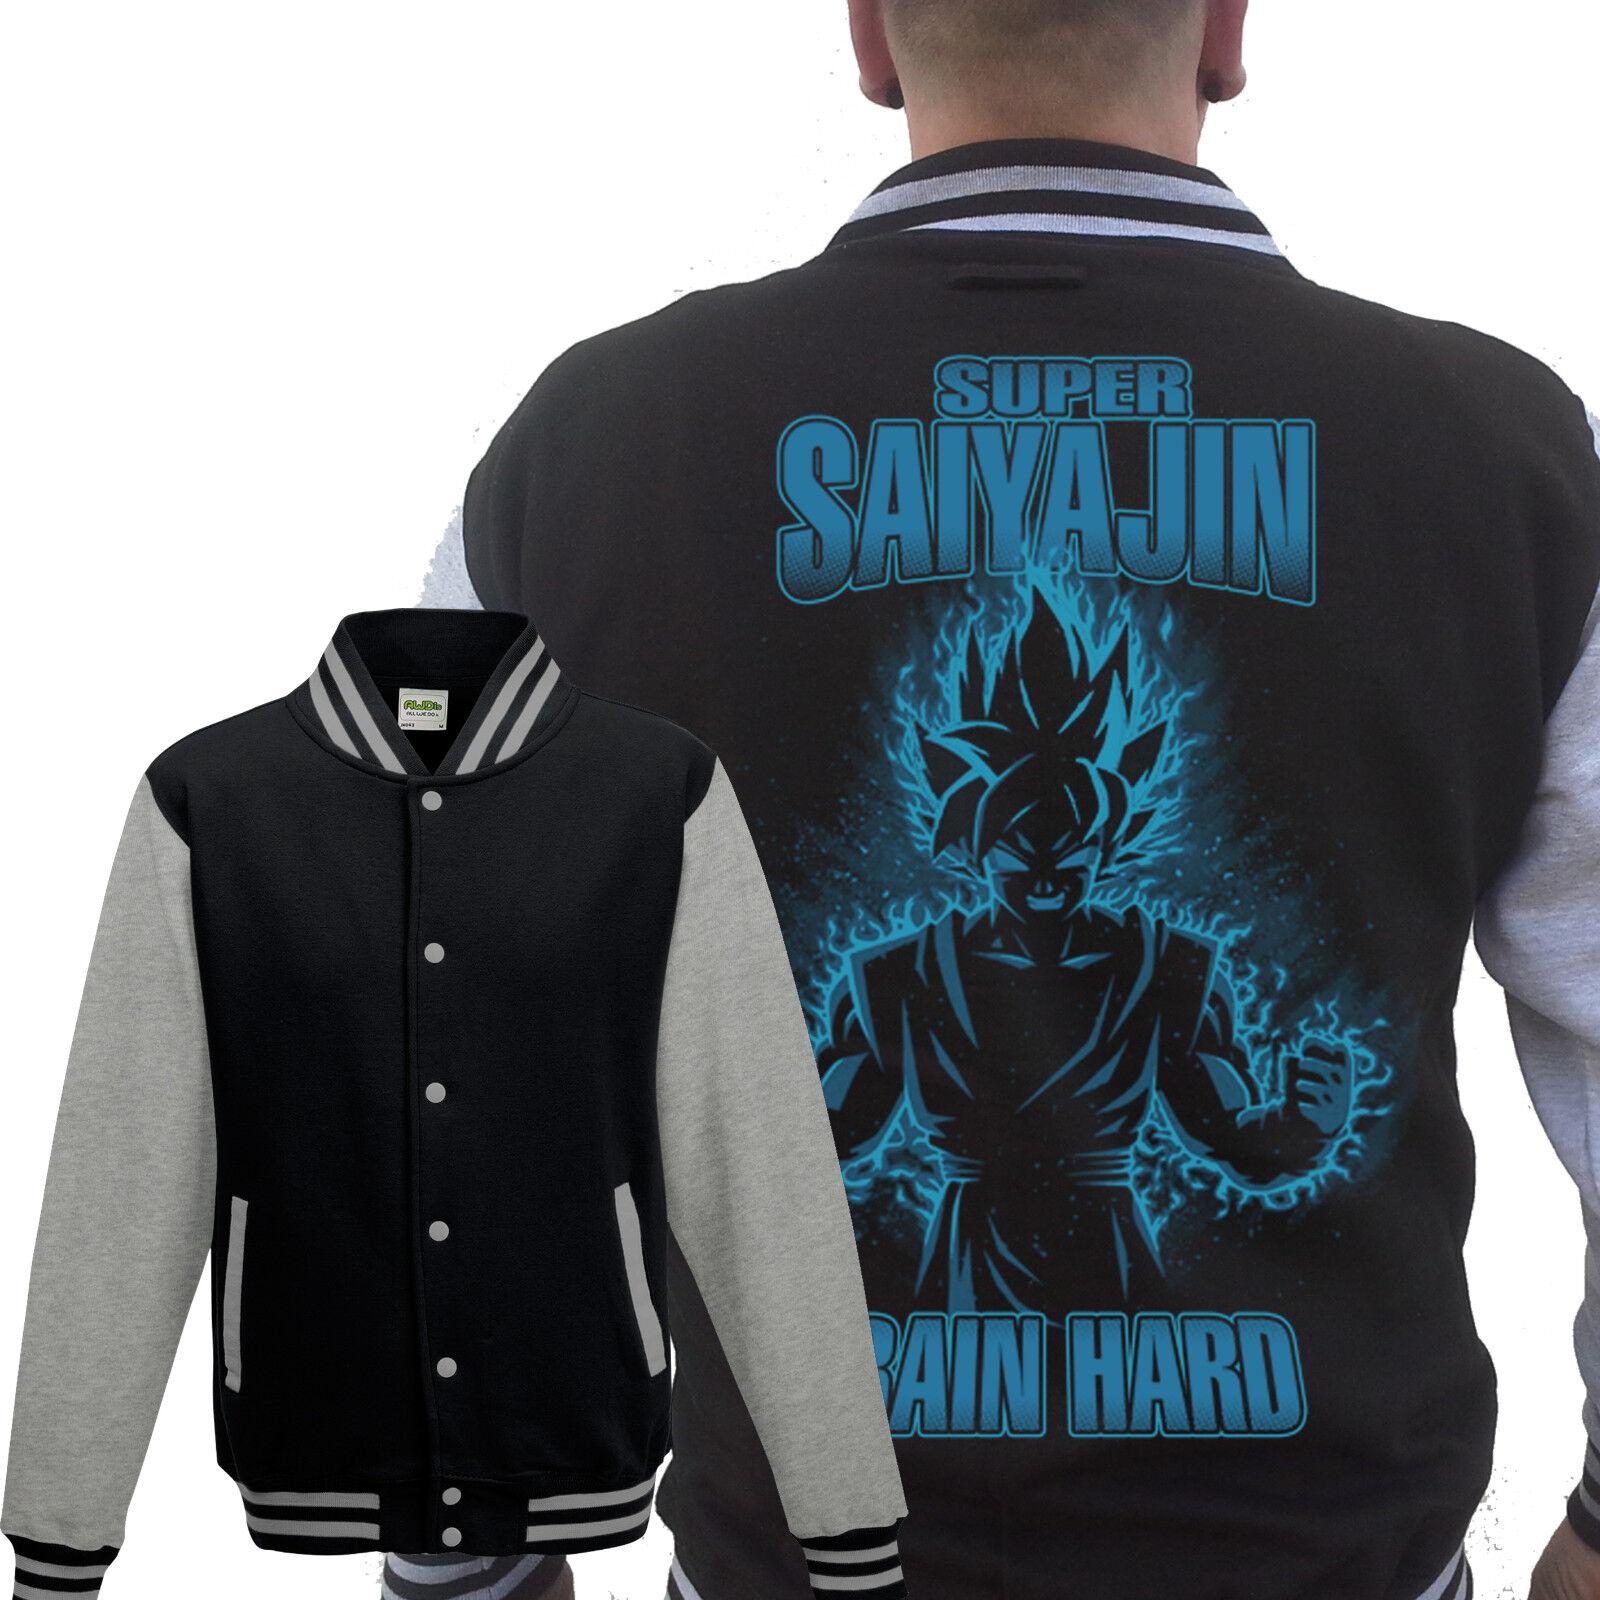 Super-Saiyajin GLOW College Grau Dragonball Z,Son Goku,Fun,Muten Roshi,Kult,TV